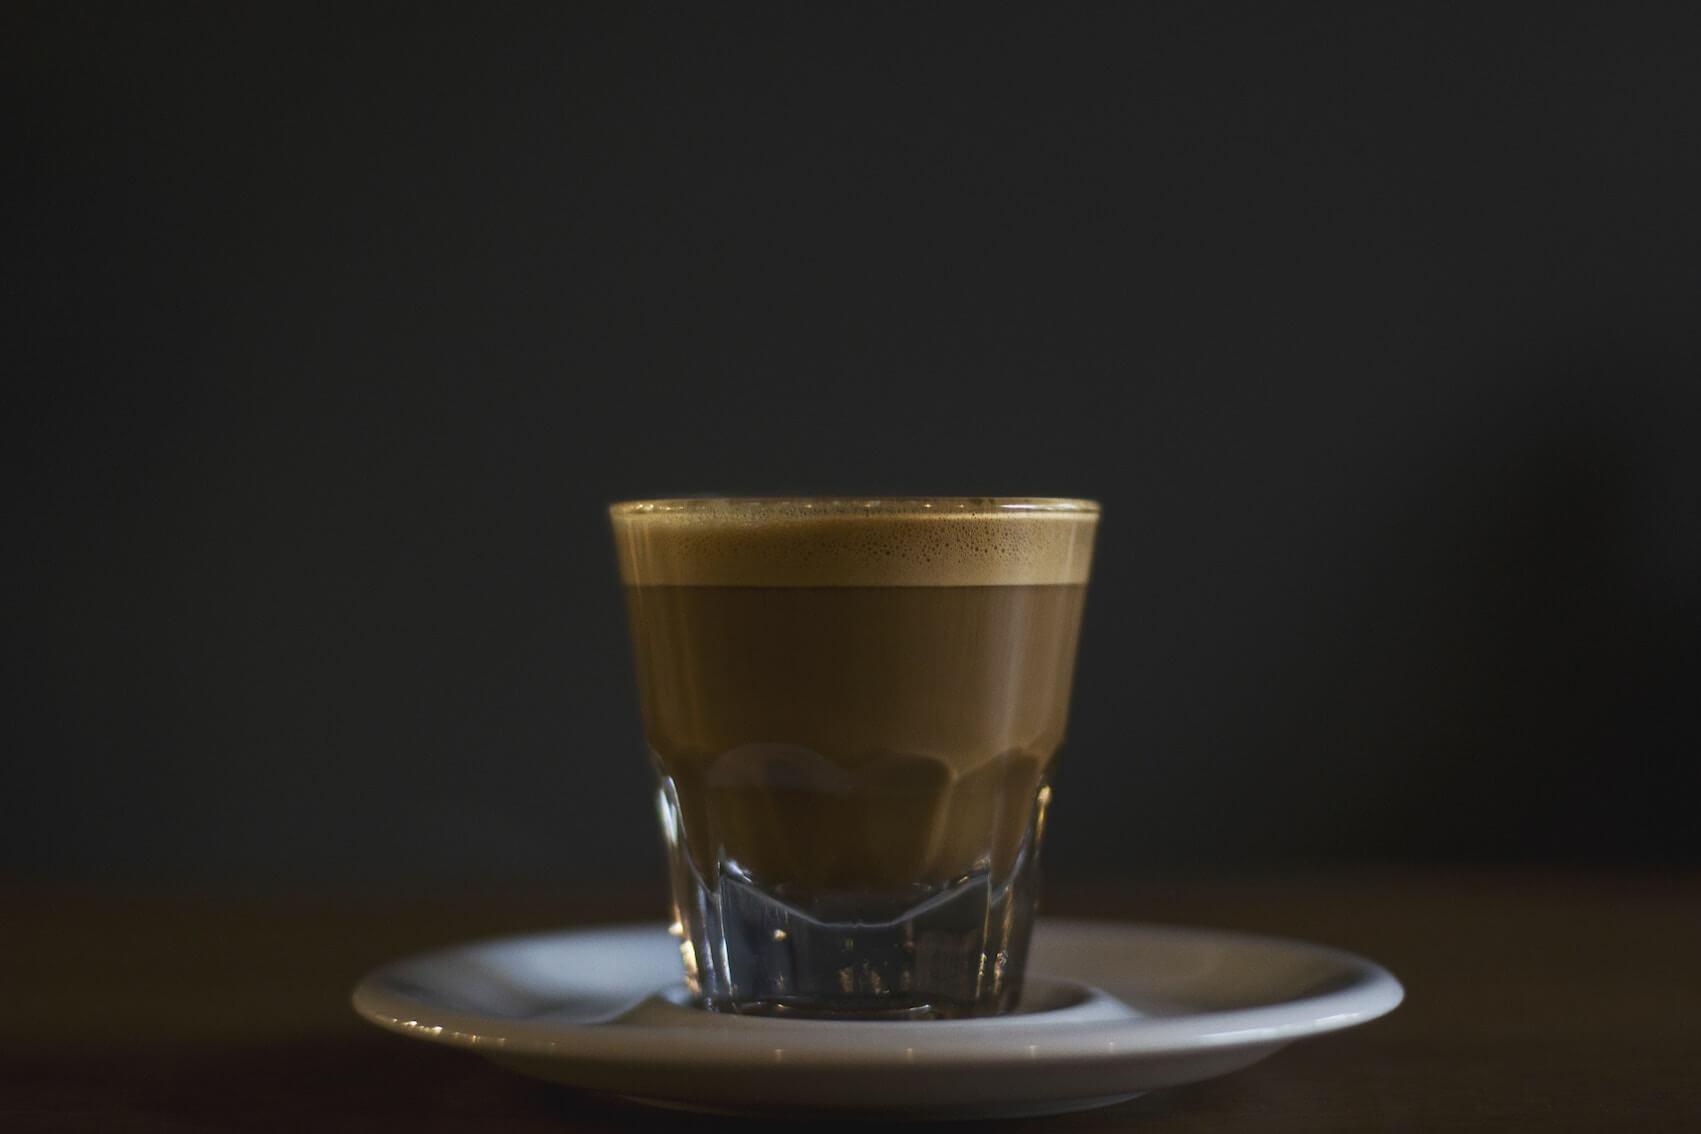 espresso-2-25c0a39ab1d9b0